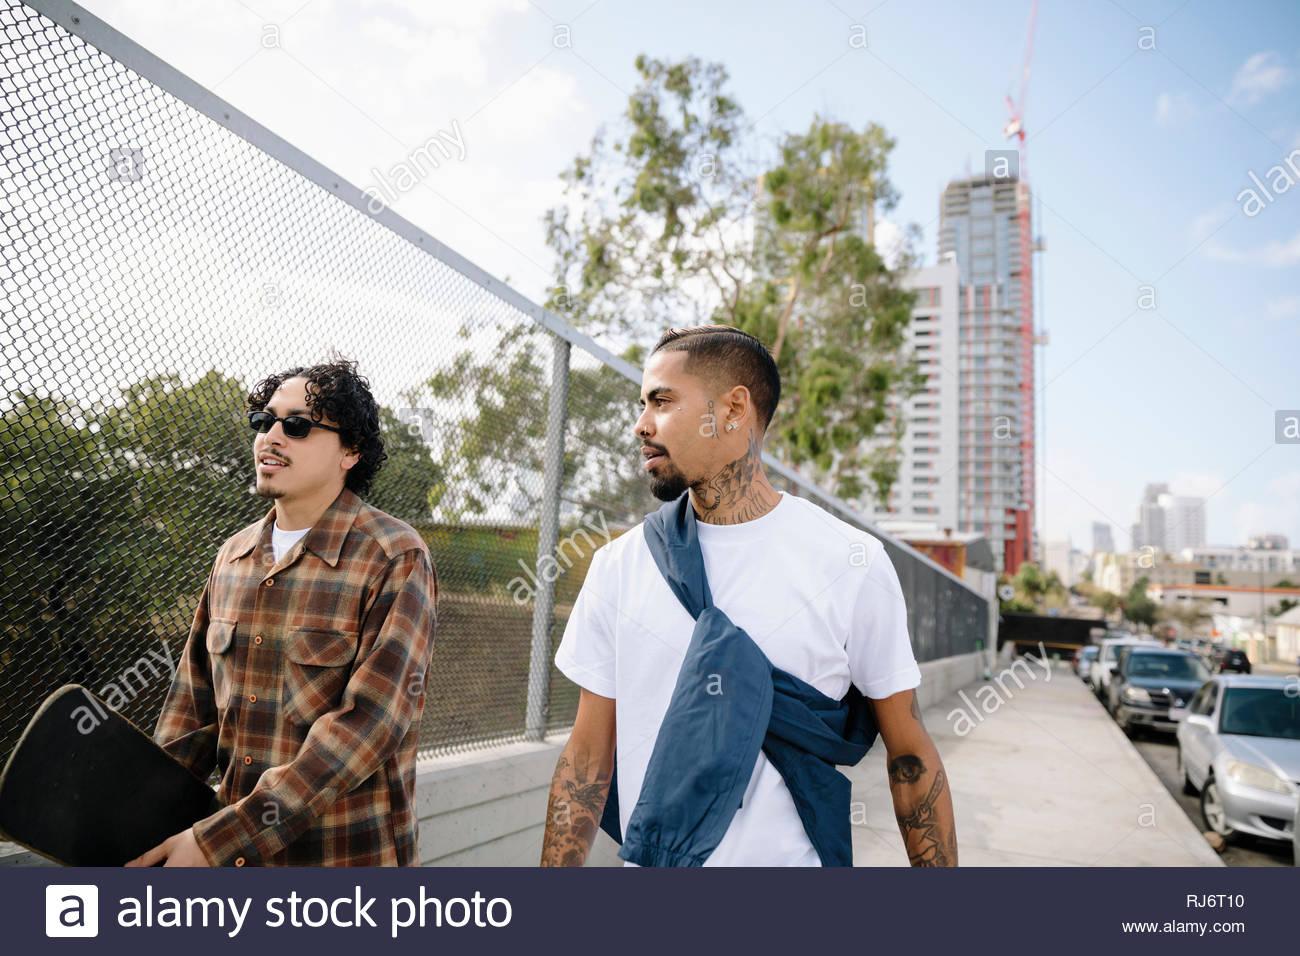 Latinx young men with skateboard walking on urban sidewalk - Stock Image